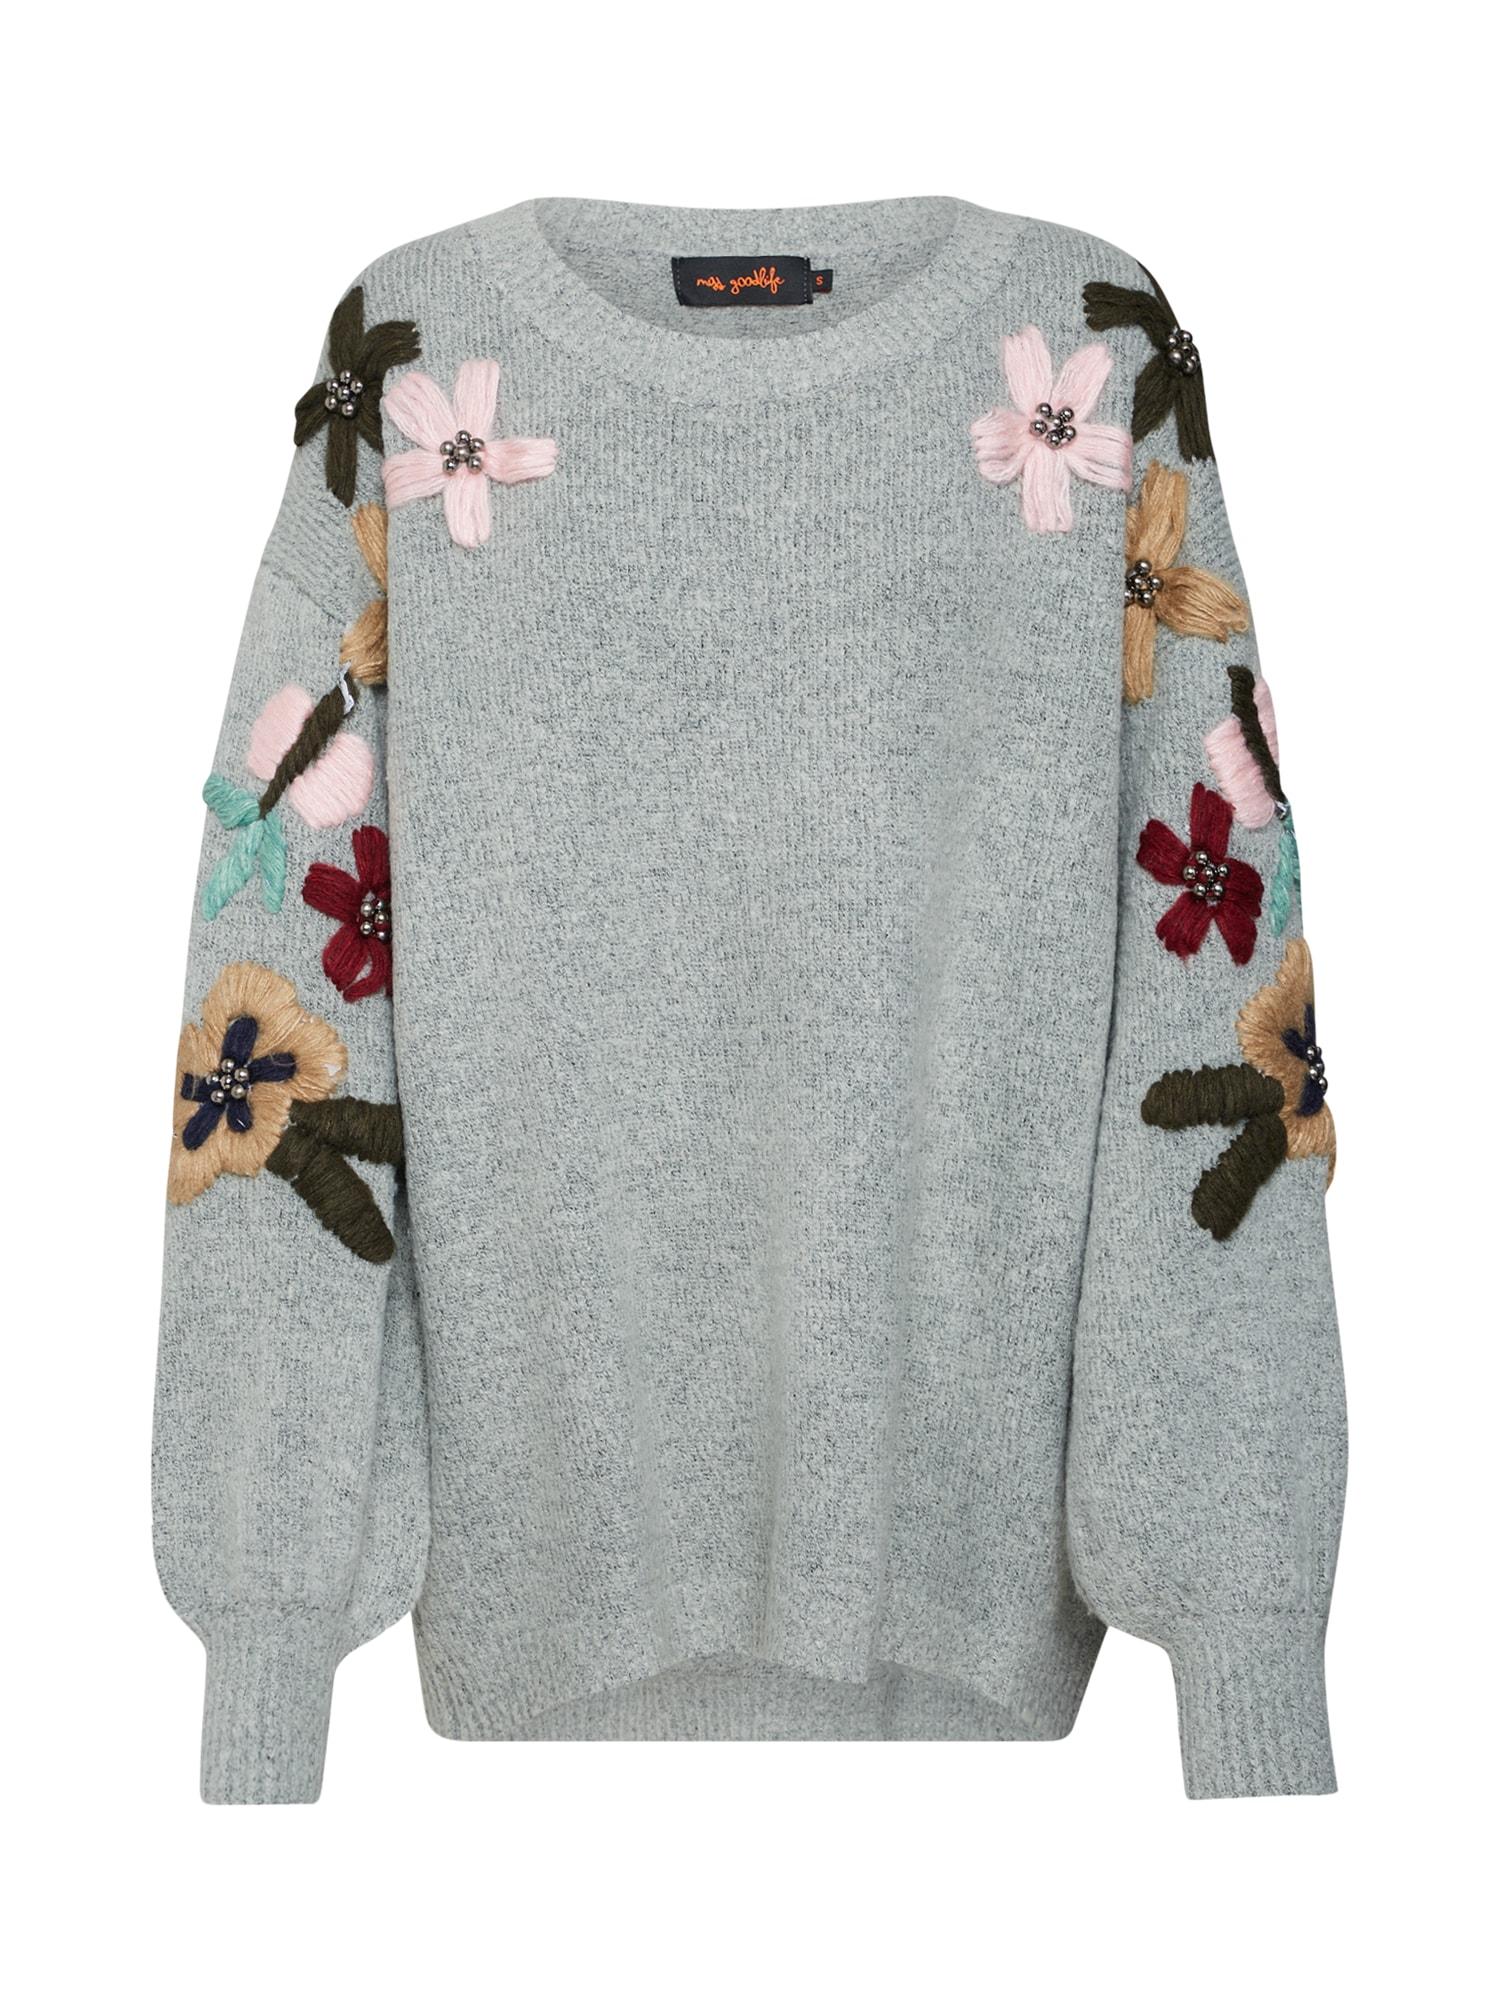 Maxi svetr Arms Flowers Embroidery světle šedá mix barev Miss Goodlife